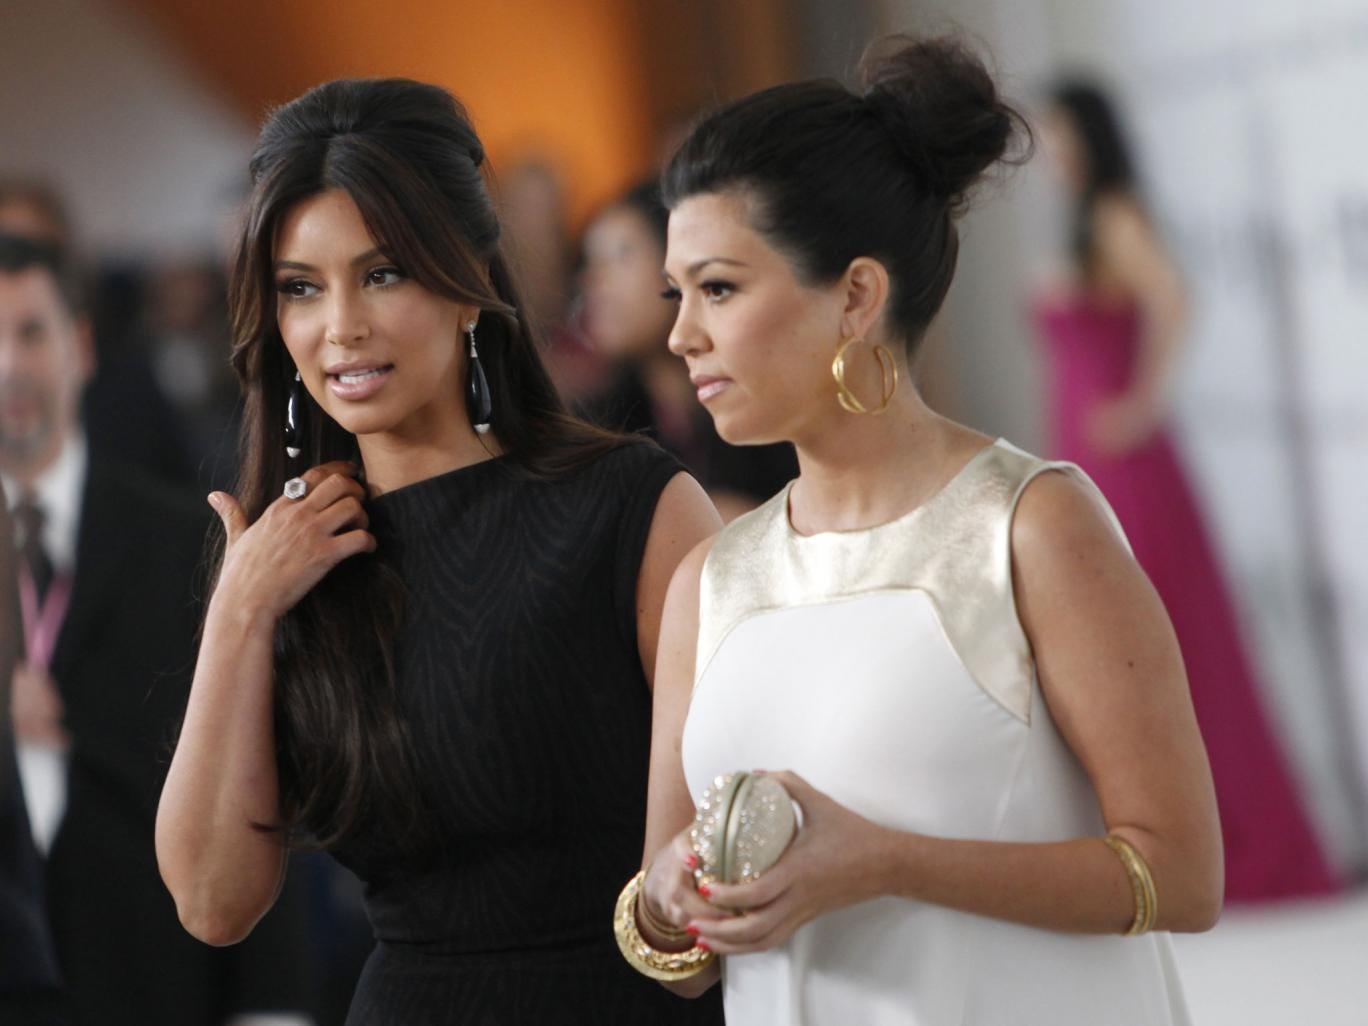 Kim (L) and Kourtney Kardashian arrive at the 20th Annual Elton John AIDS Foundation Academy Awards